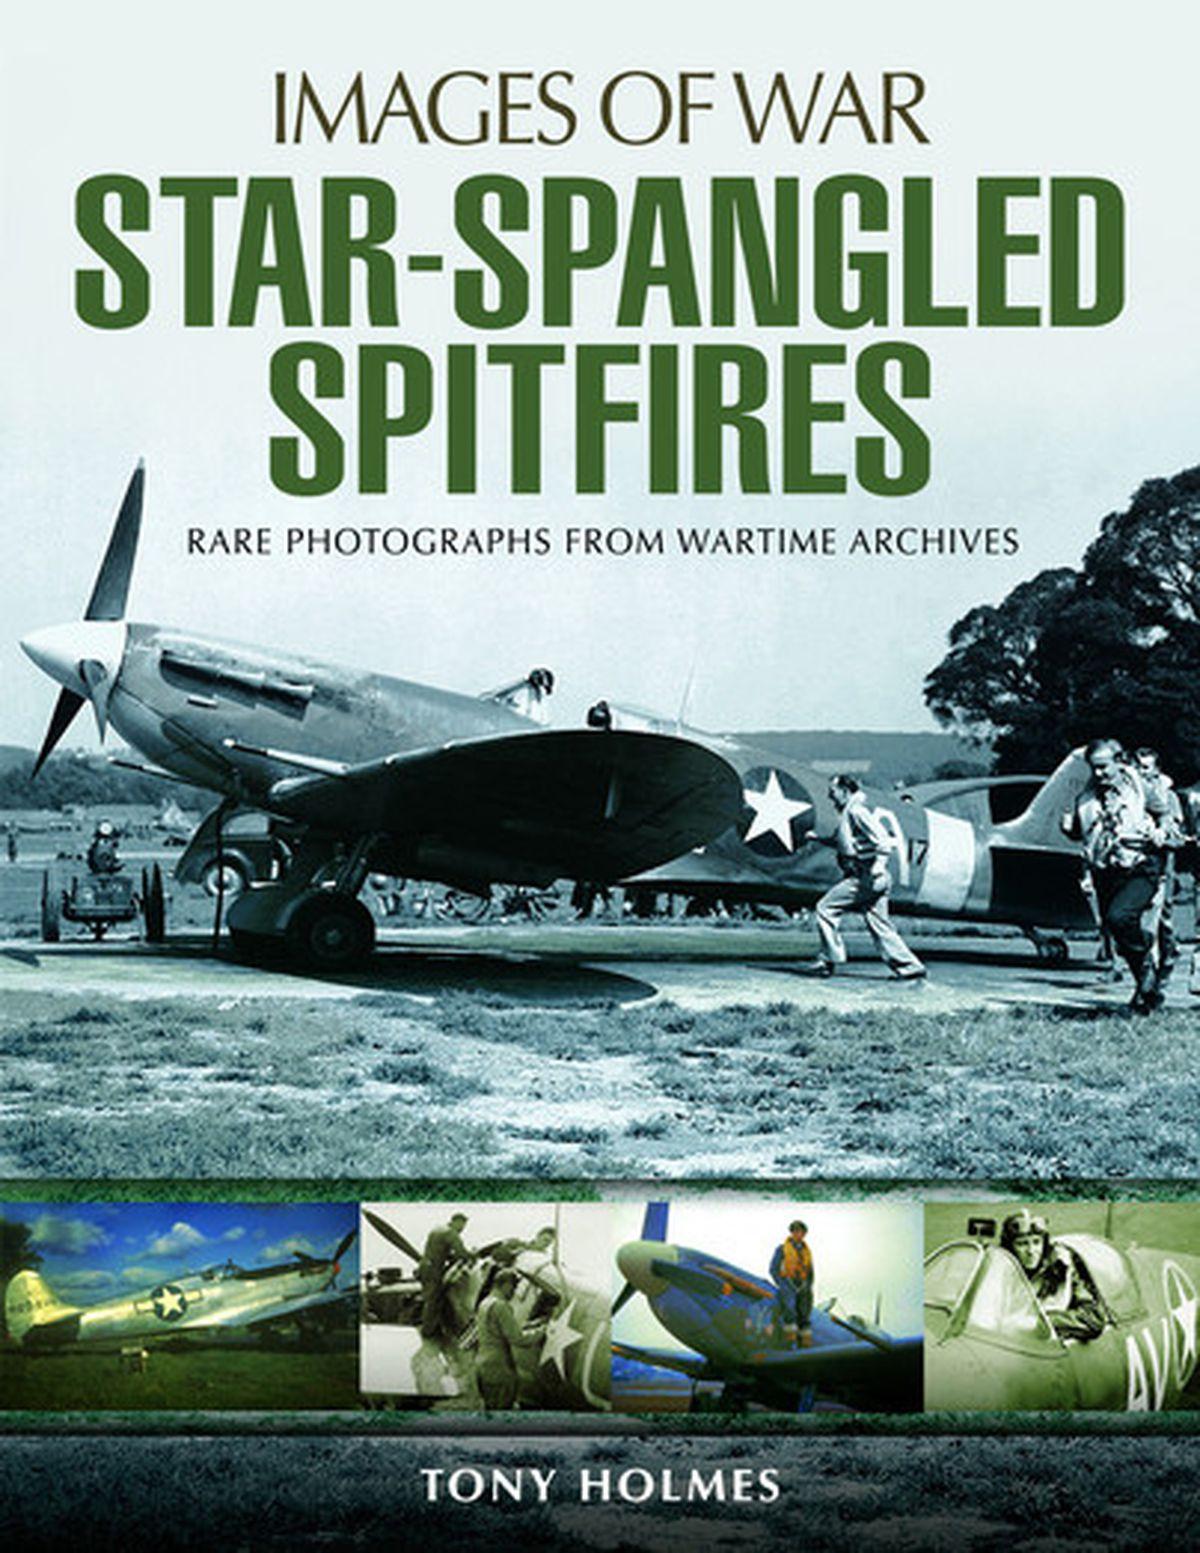 Star-Spangled Spitfires by Tony Holmes.